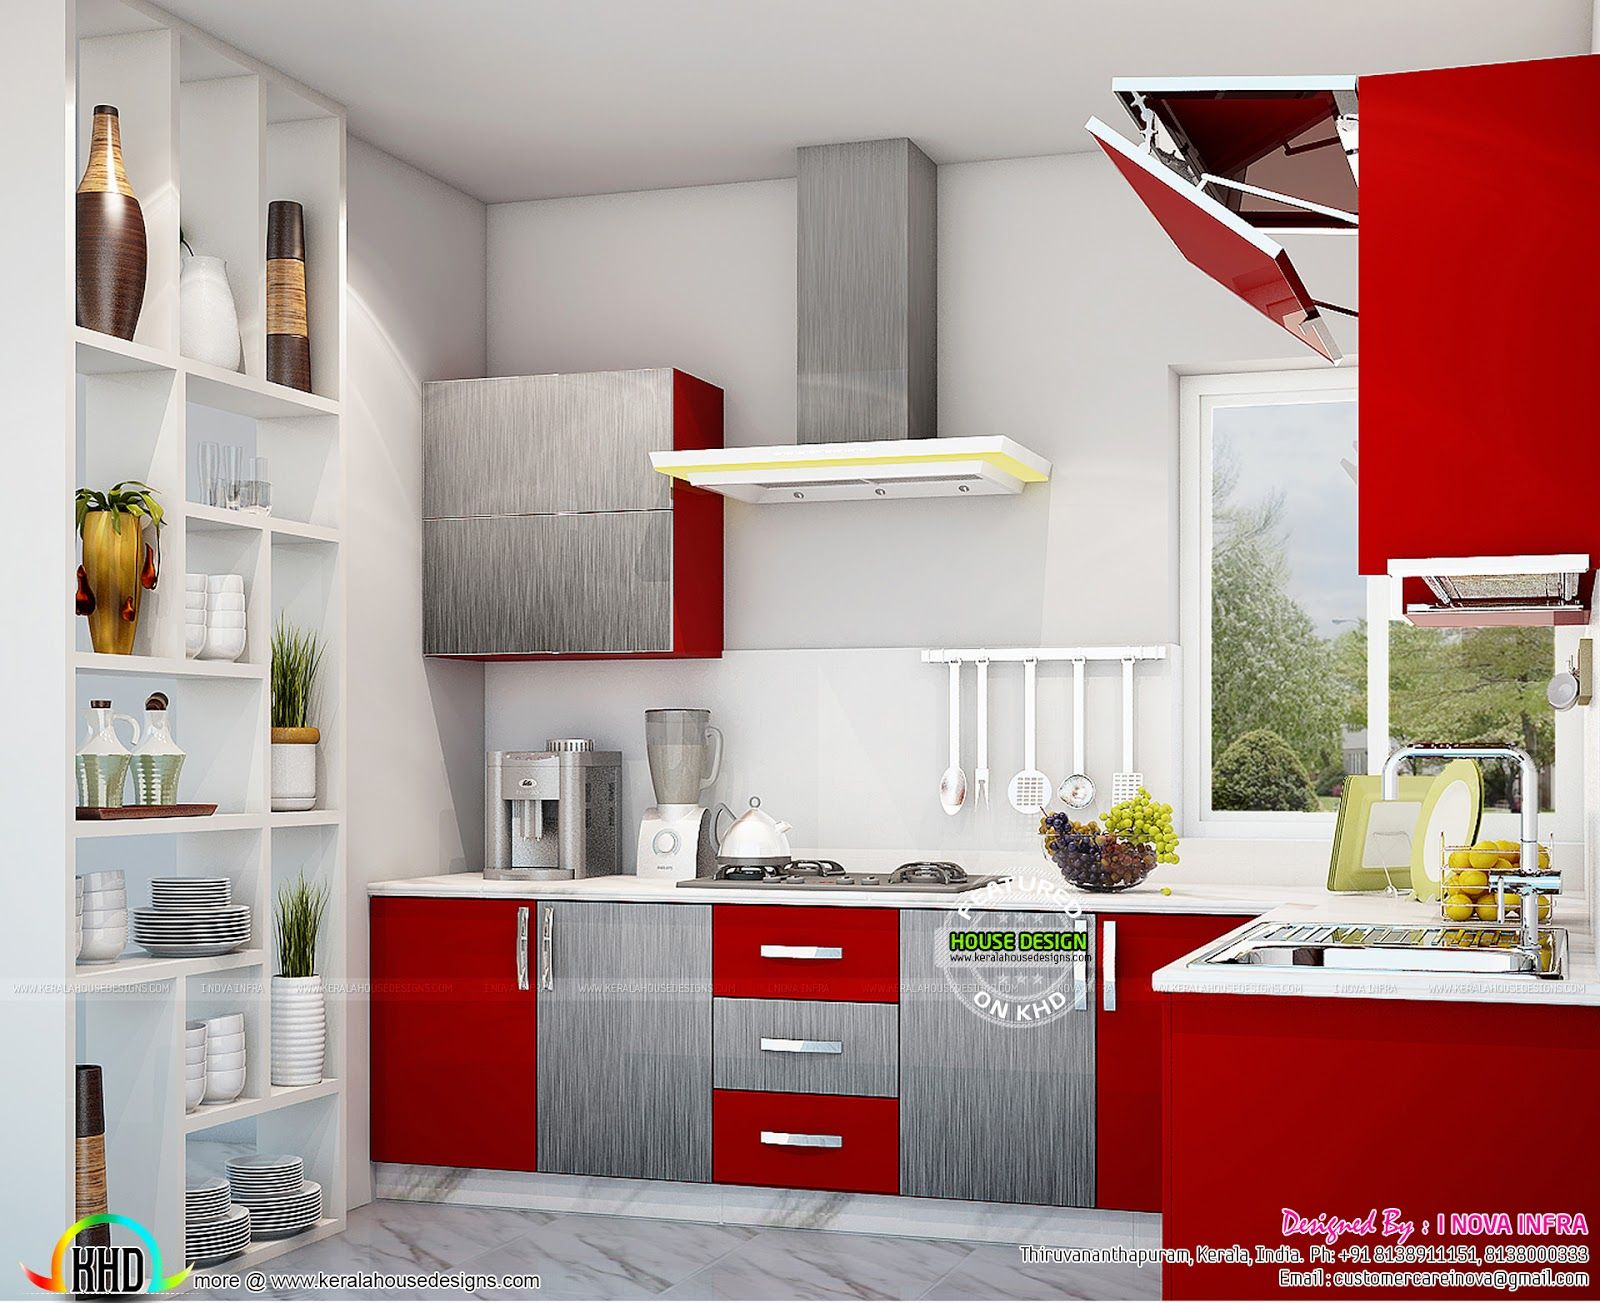 Kitchen interior works at trivandrum kerala home design also renovation rh pinterest